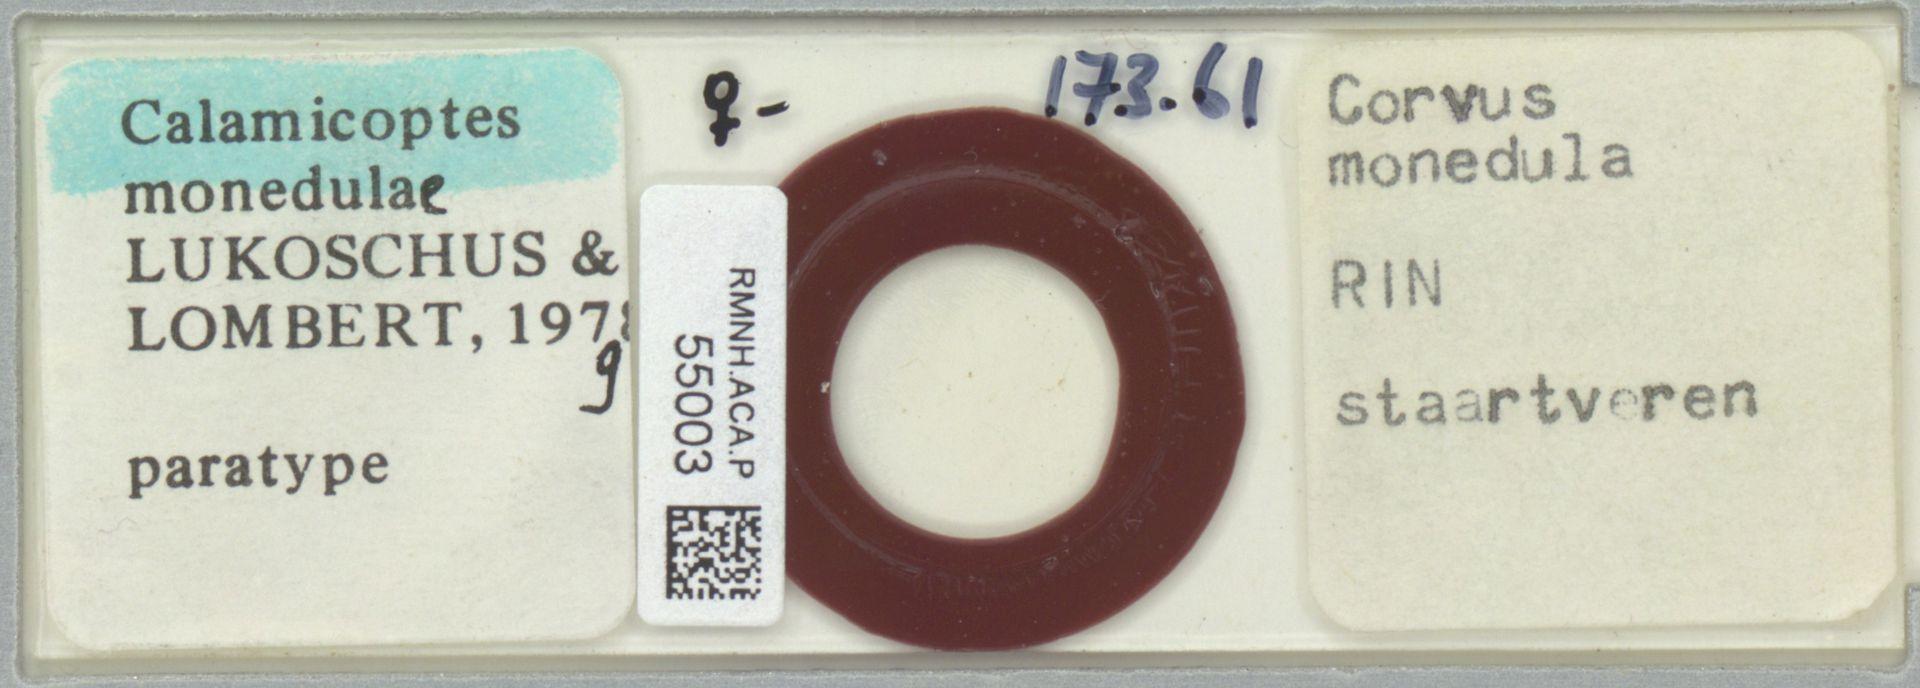 RMNH.ACA.P.55003 | Calamicoptes monedulae Lukoschus & Lombert, 1979